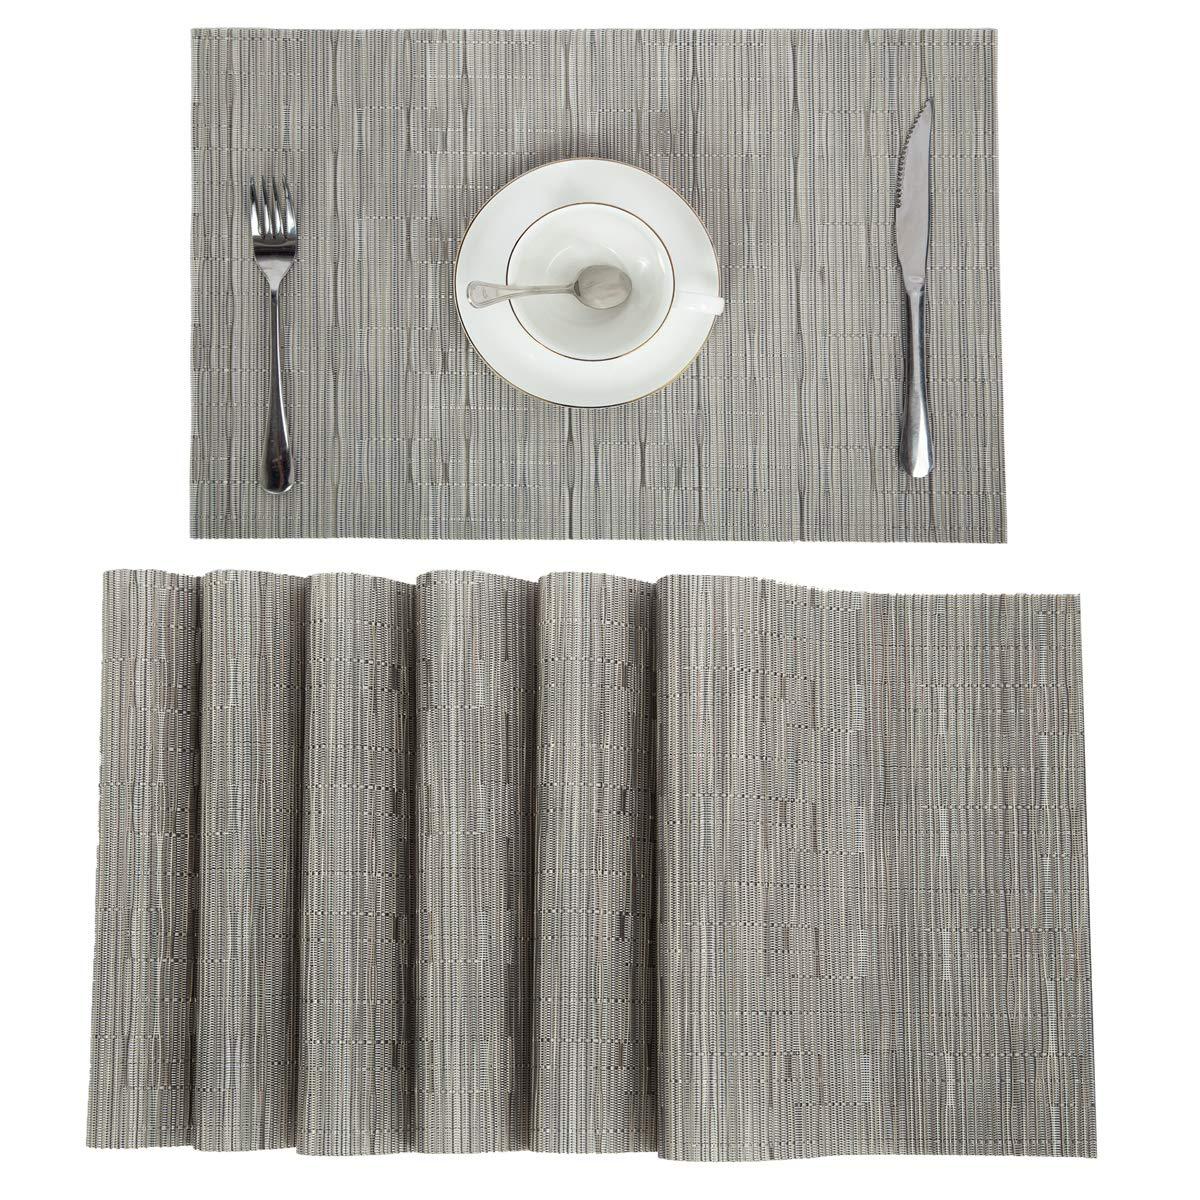 Pauwer PVC Placemats Set of 8 Washable Woven Vinyl Placemat for Kitchen Table Heat Resistant Non-Slip Kitchen Table Place Mats Wipe Clean (8pcs Placemats, Silver Grey)